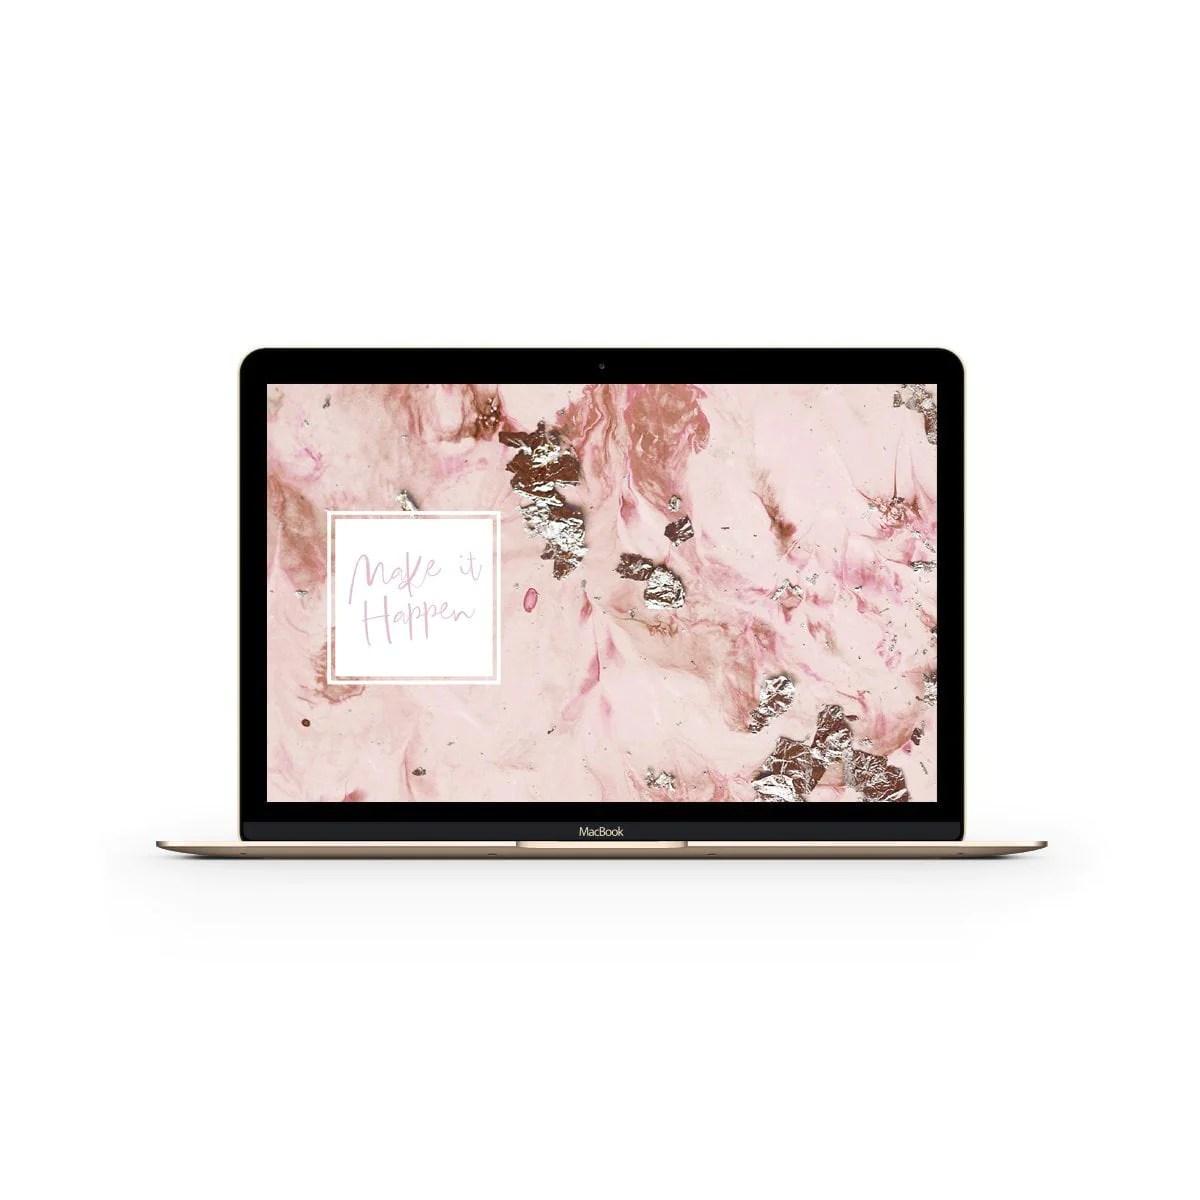 Poppy Wallpaper For Iphone Free Downloads Miss Poppy Design